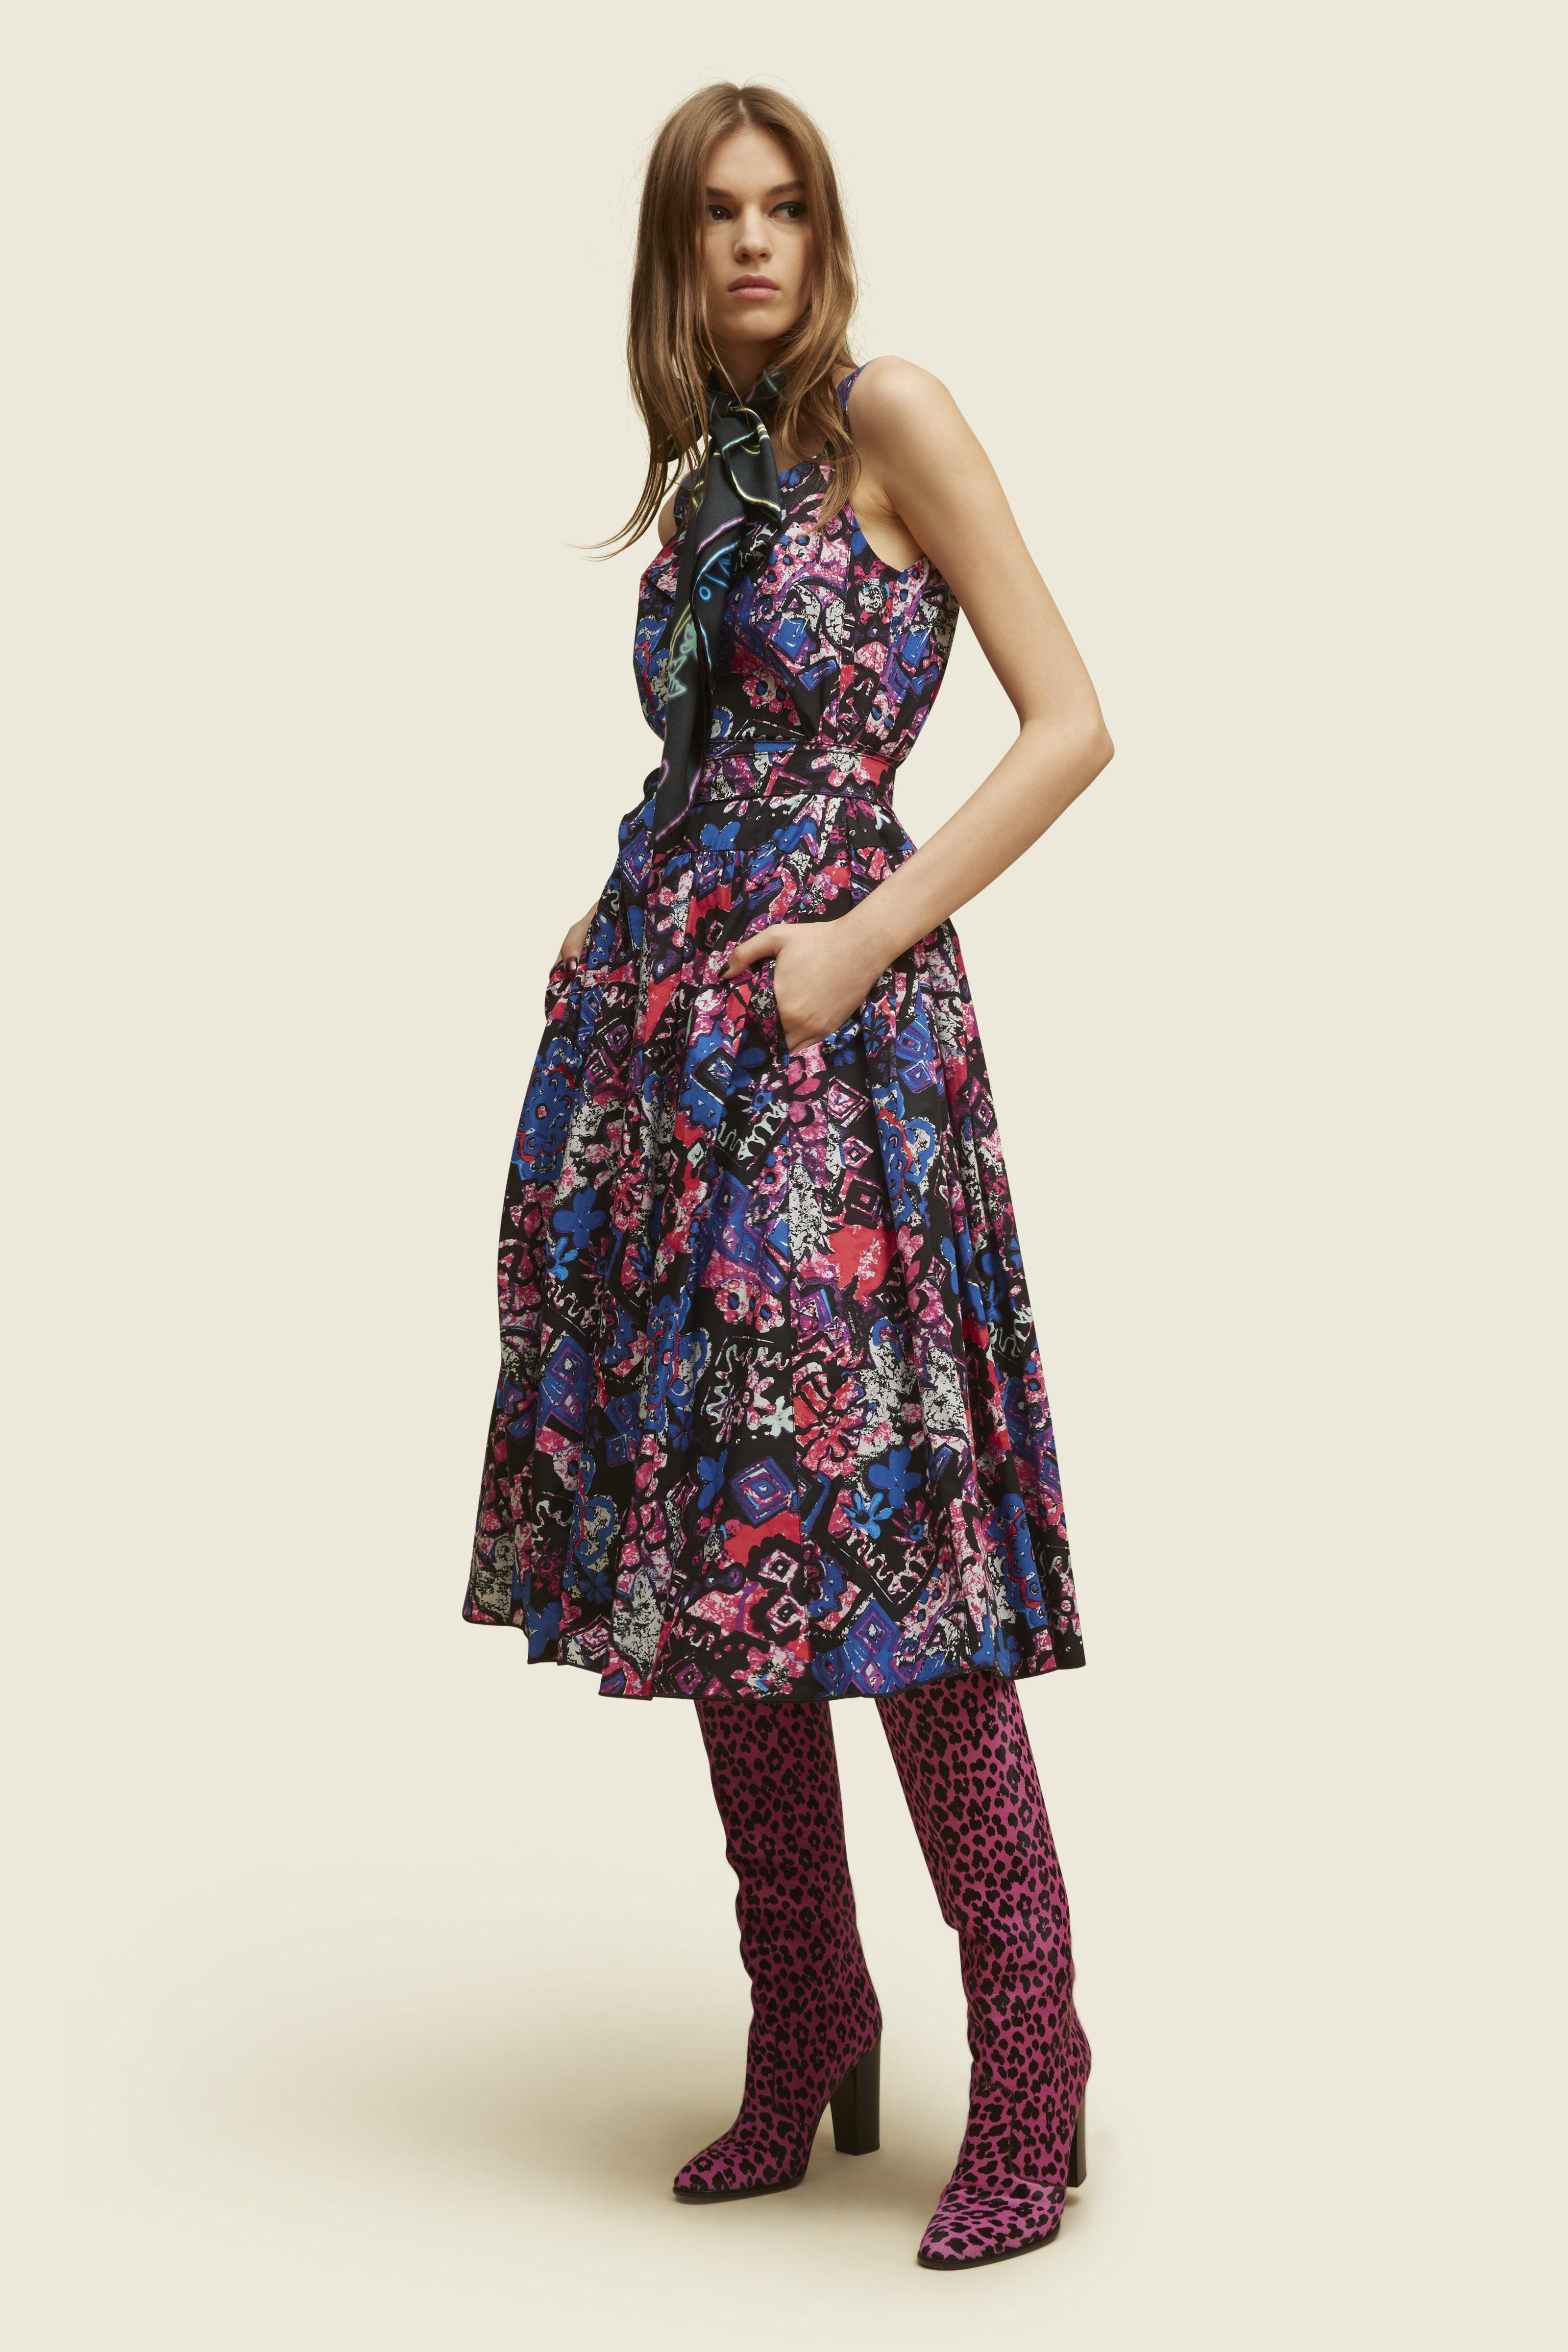 Short-Sleeve Ruffle Dress - Marc Jacobs